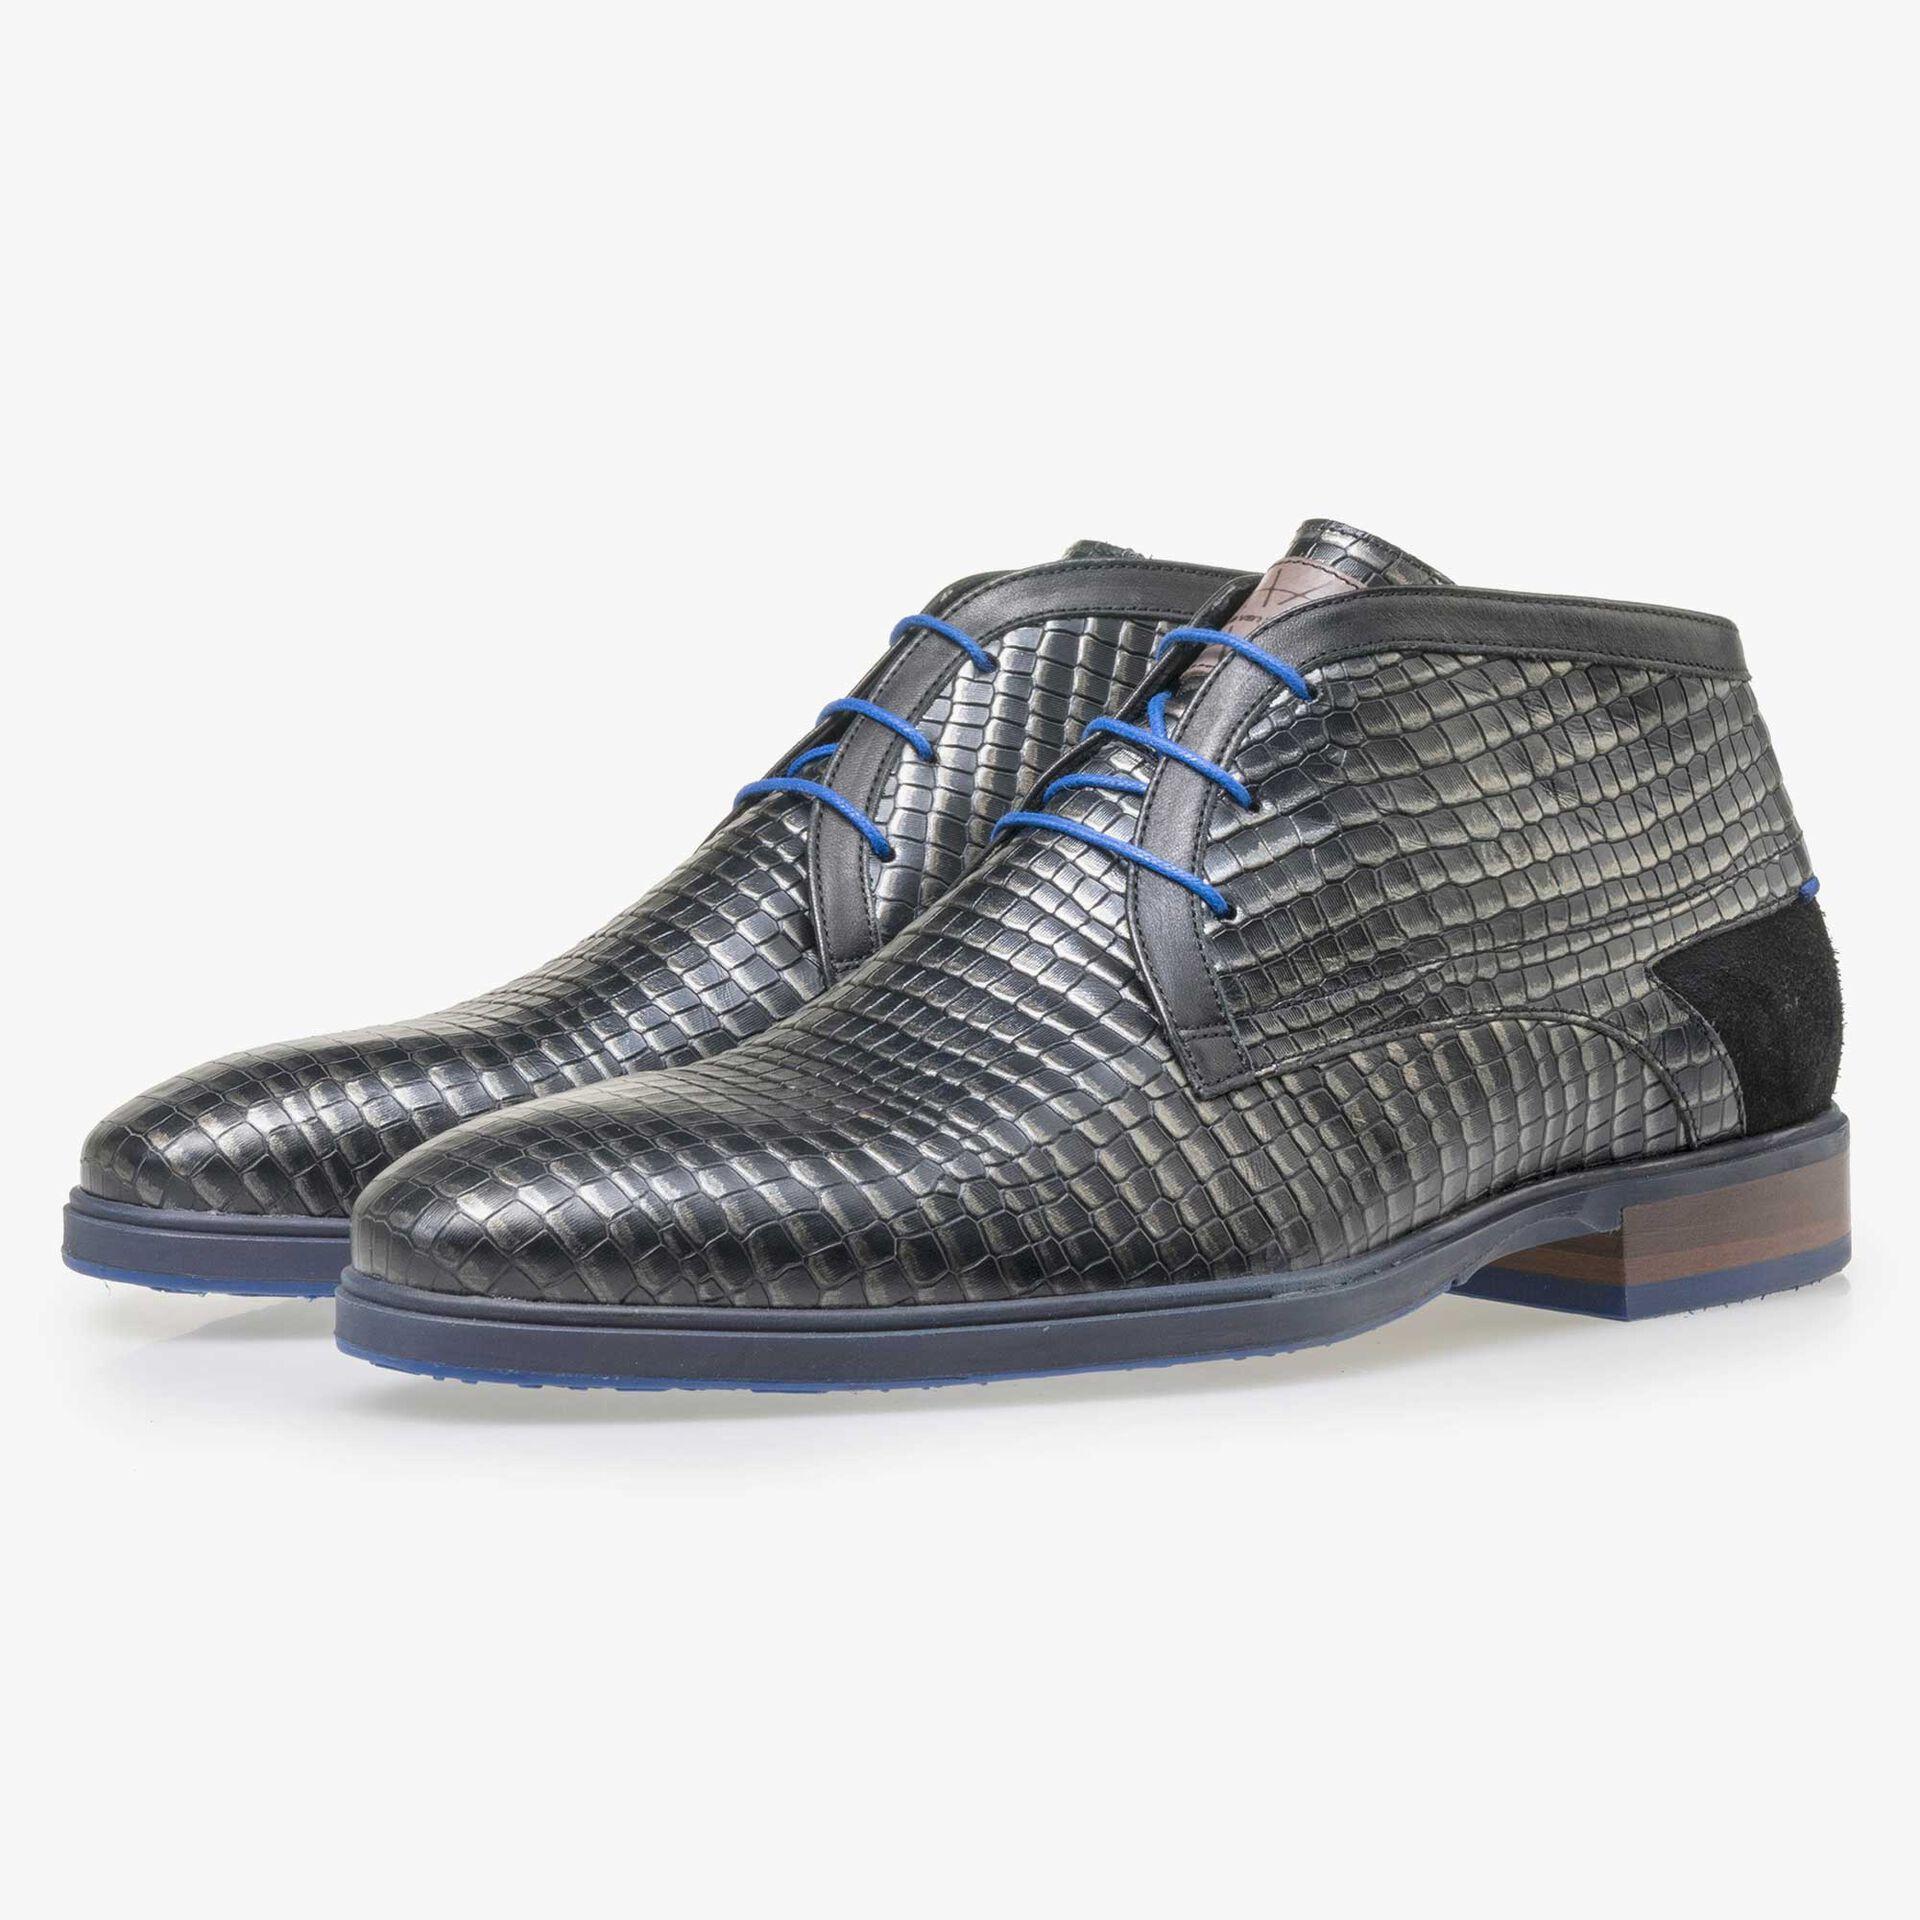 Floris van Bommel men's black leather lace boot with a grey metallic pattern